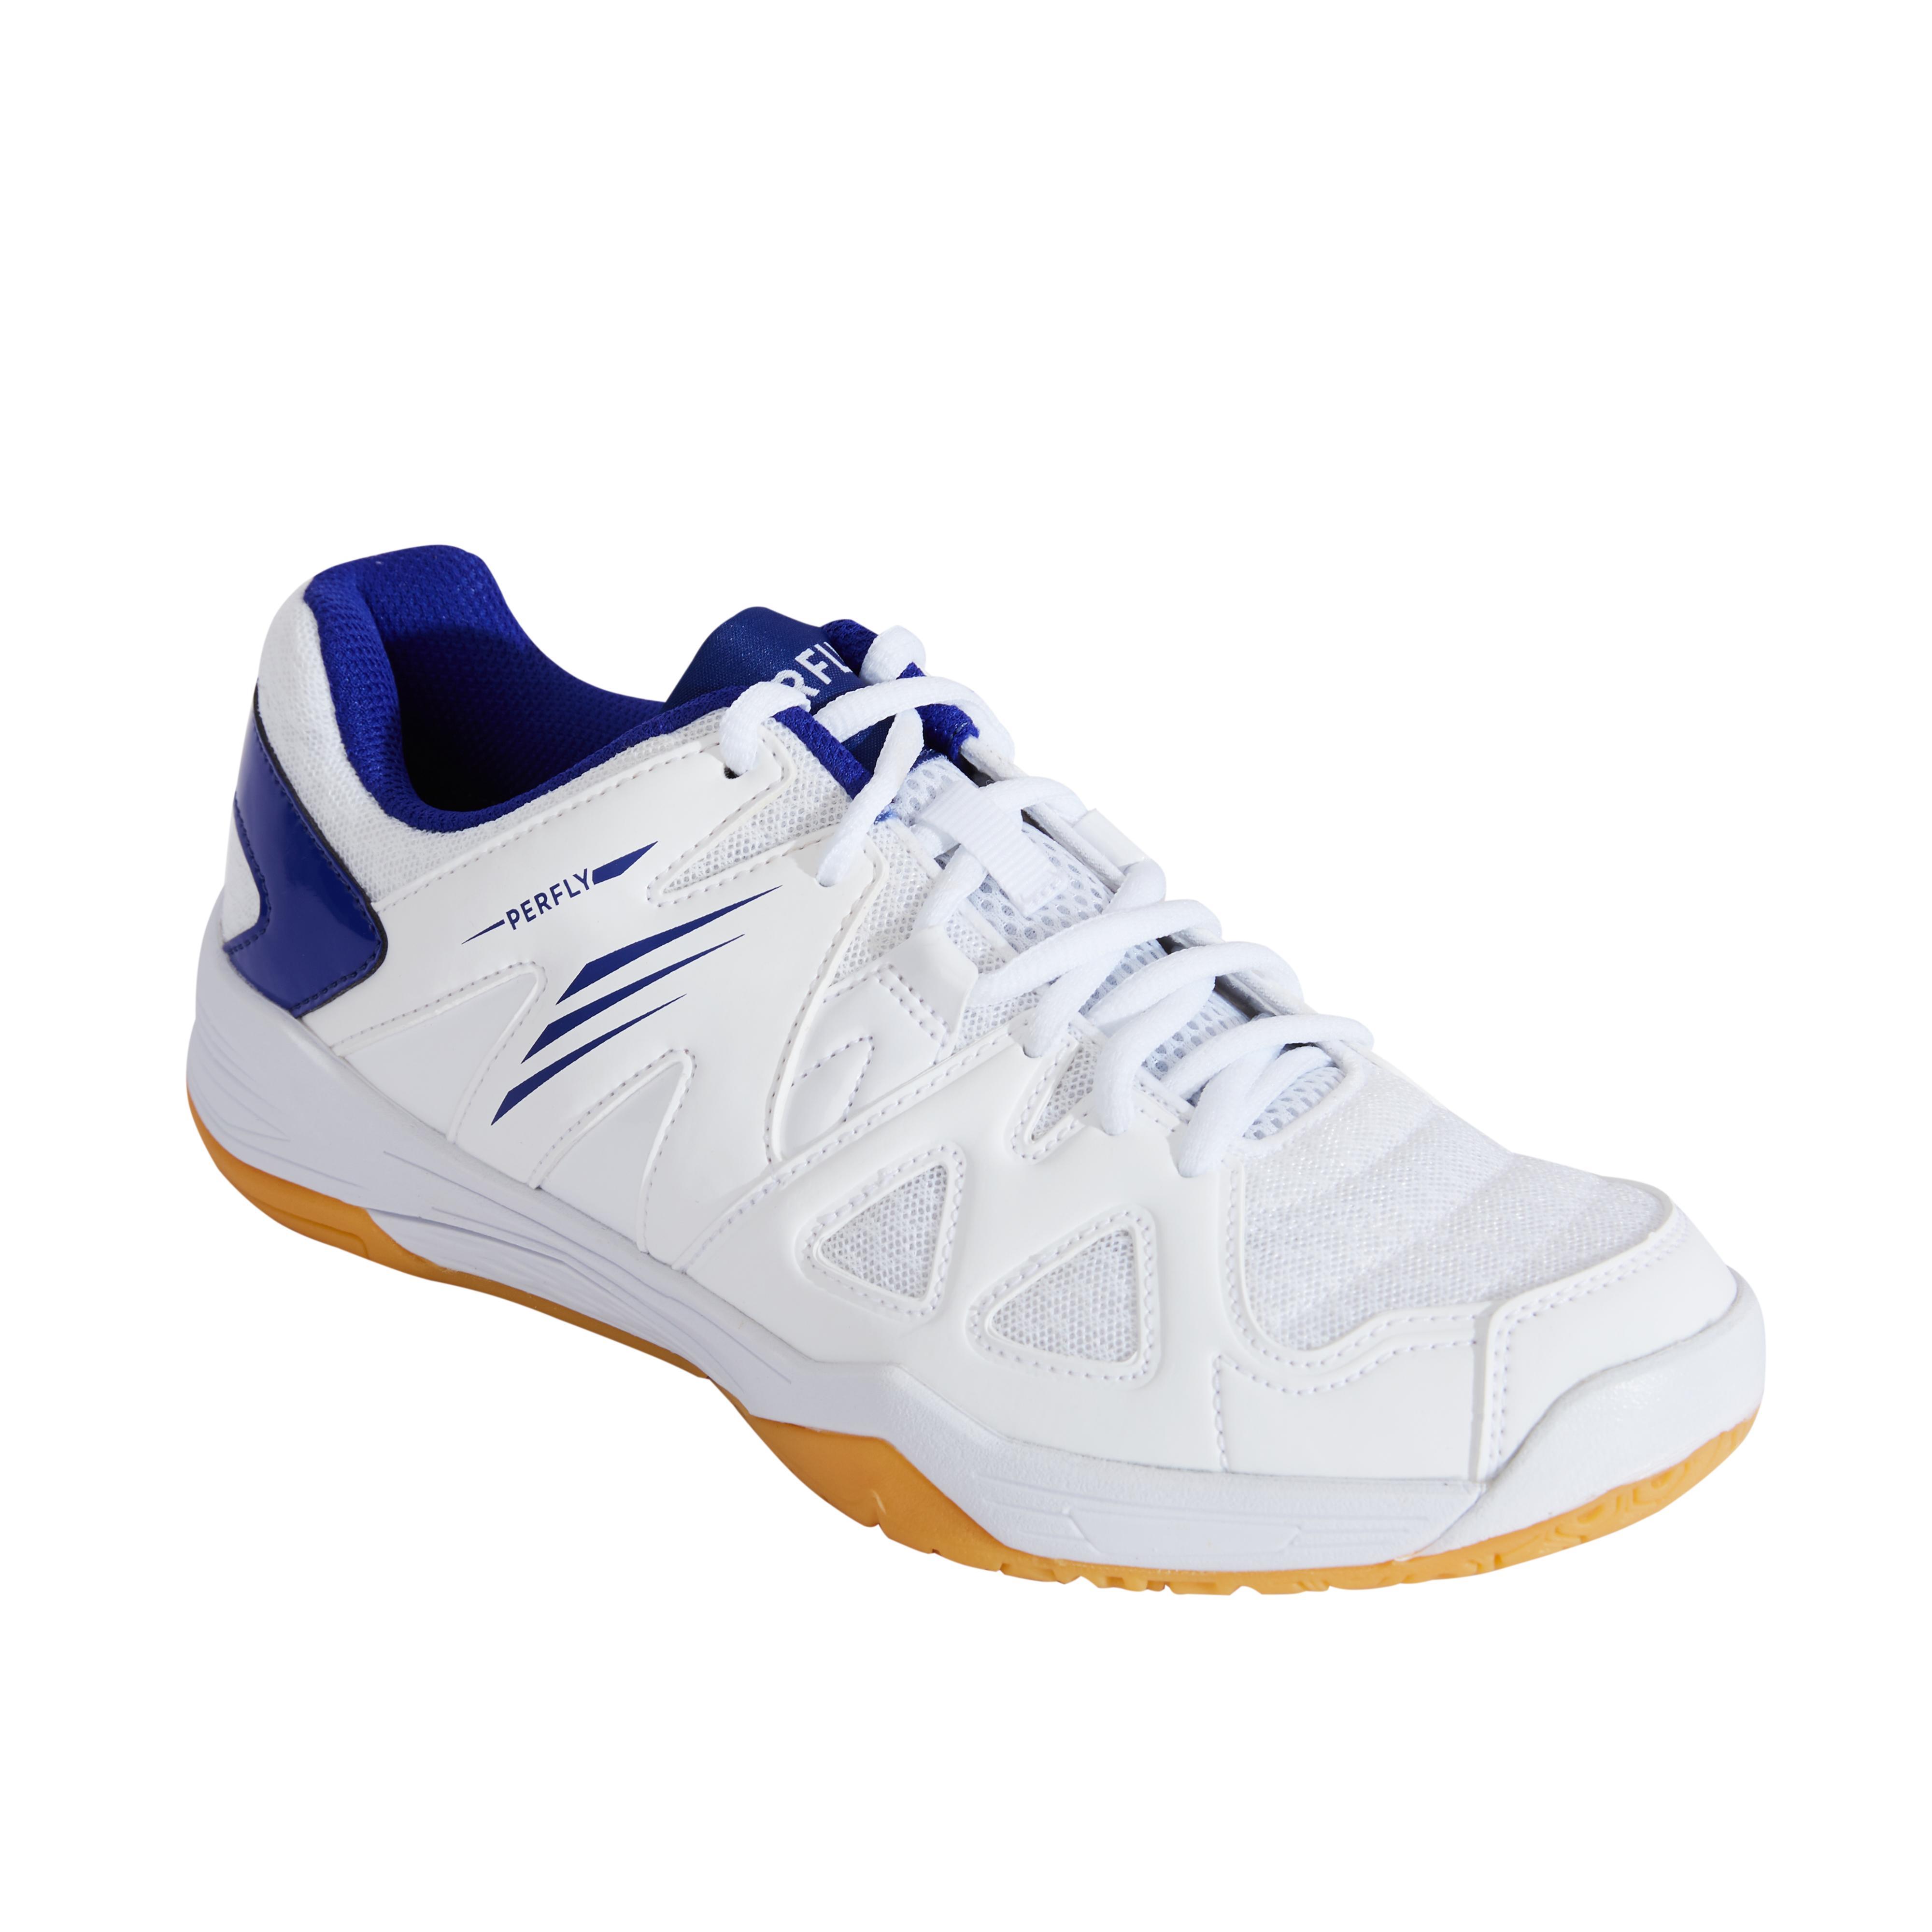 PERFLY Chaussures De Badminton Femme BS530 - Blanc/Bleu - PERFLY - 36